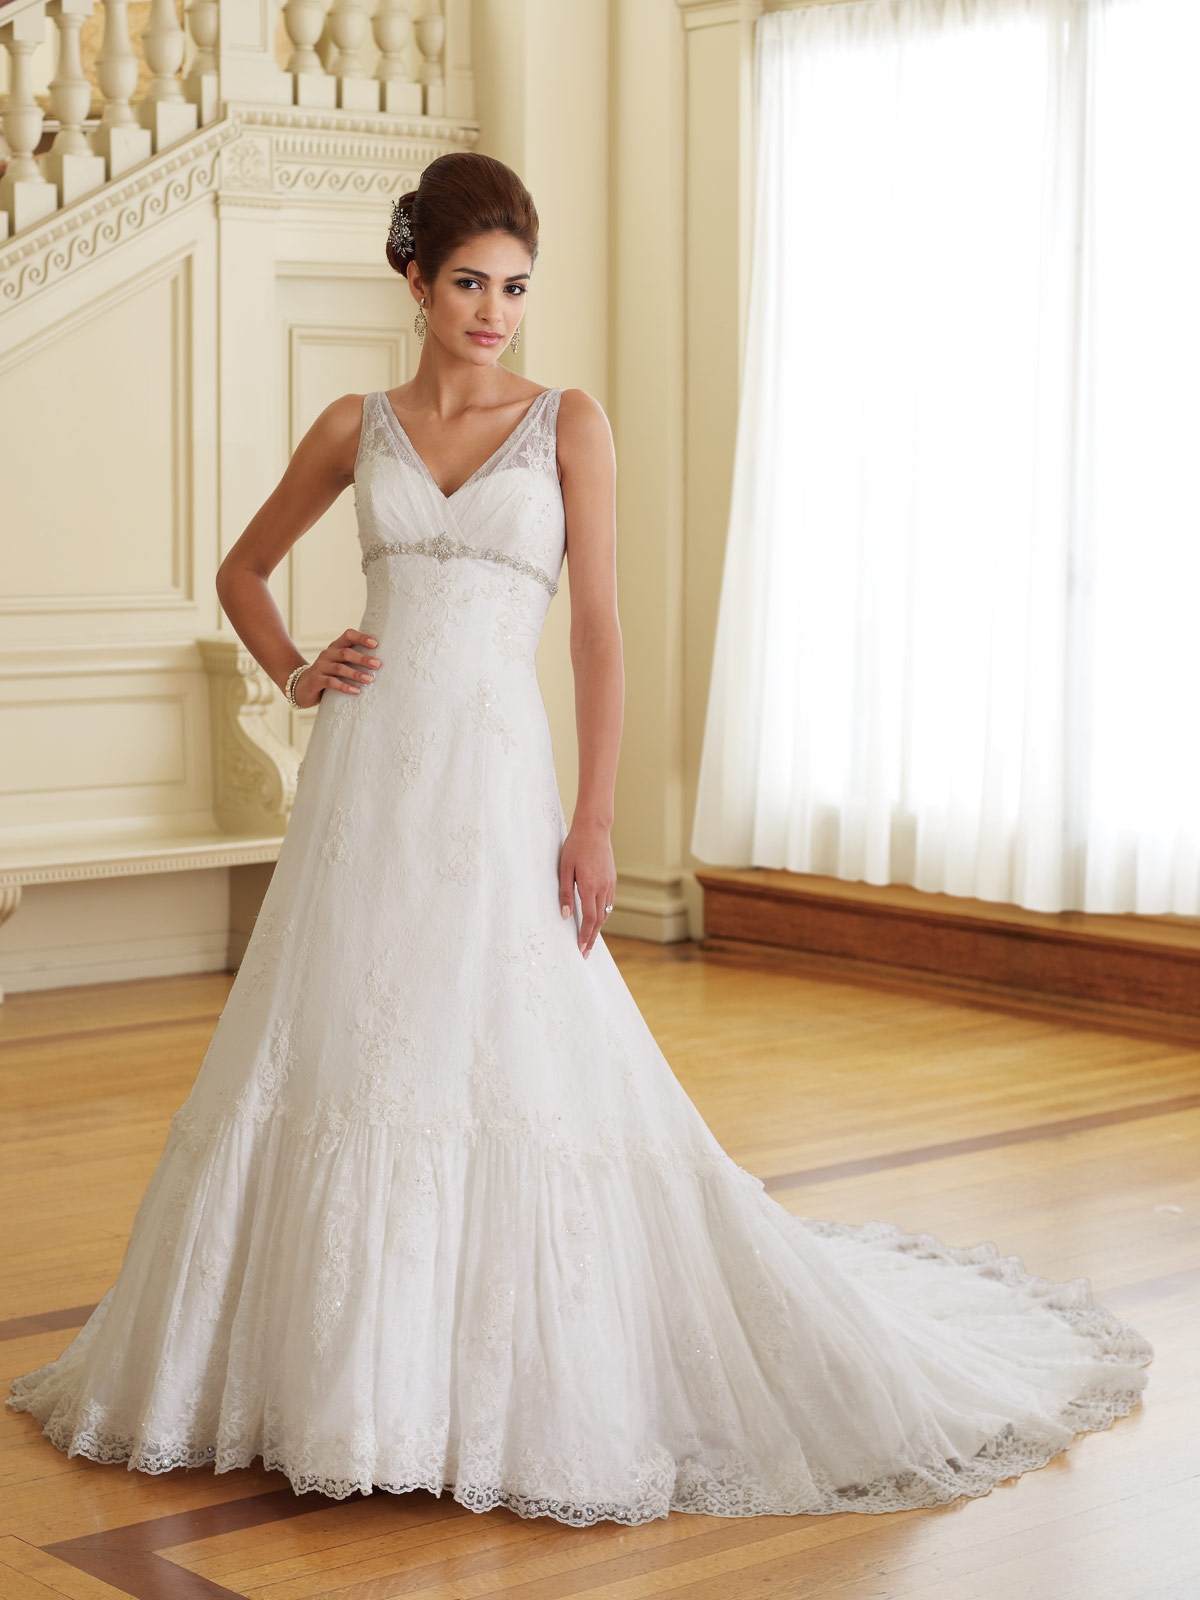 Wedding dresses set 2 hairstyle qoutes tattoo for Dresses that look like wedding dresses